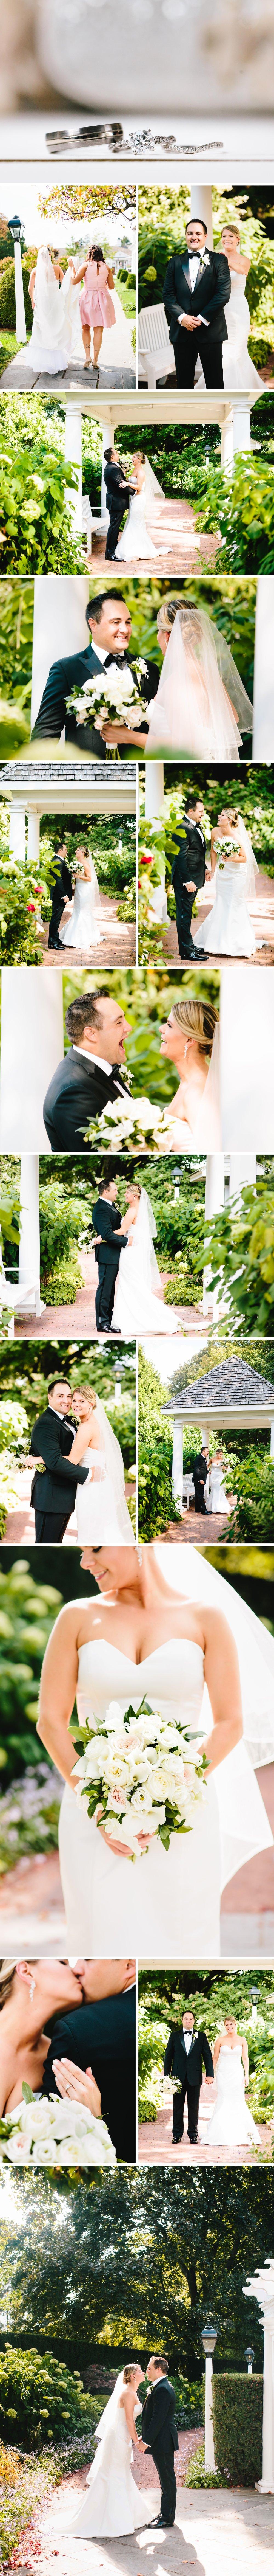 chicago-fine-art-wedding-photography-niemiec2